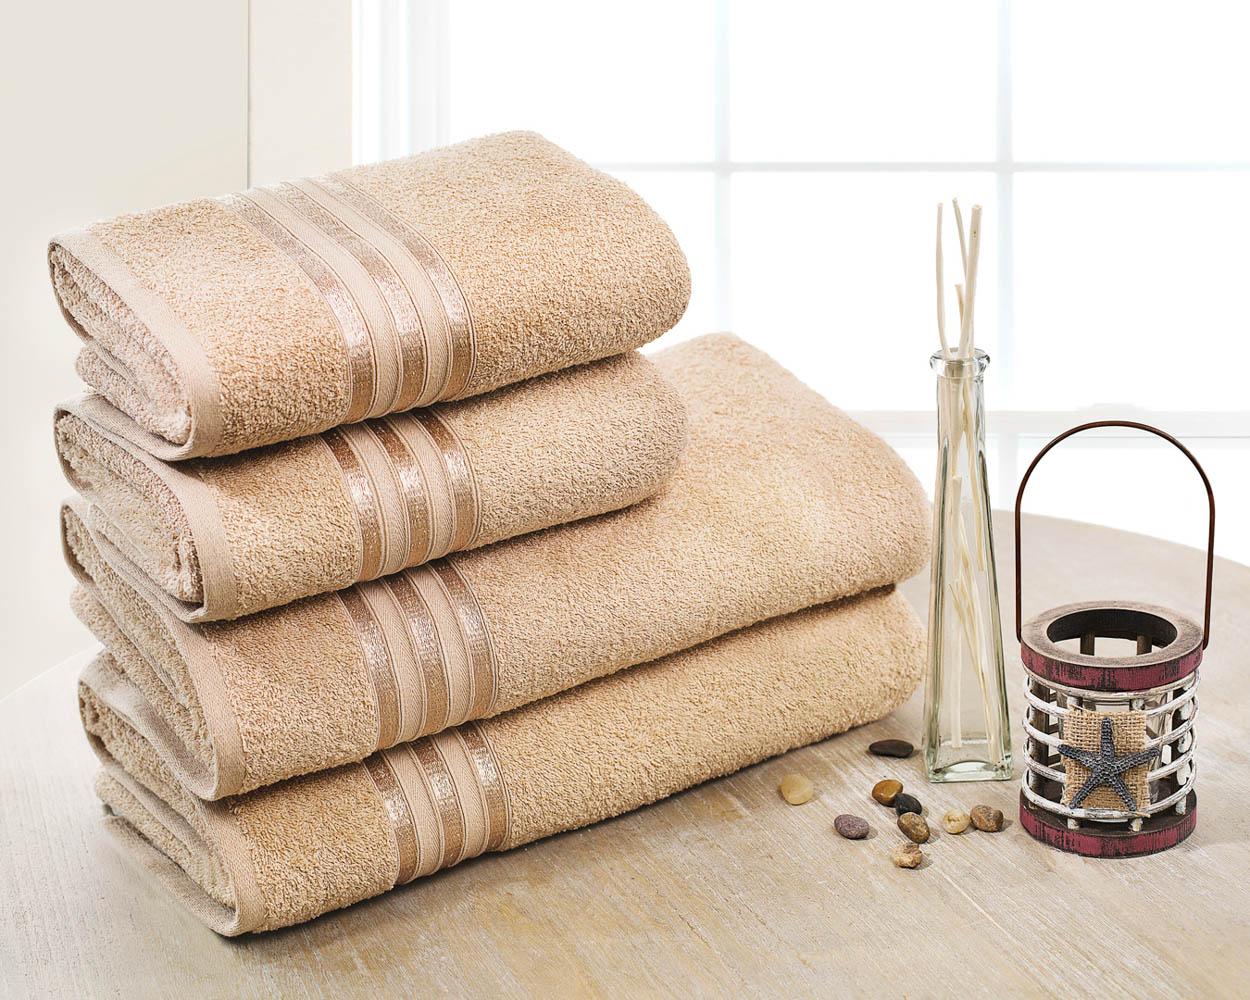 Полотенца Dome Набор из 4 полотенец Harmonika Цвет: Бежевый полотенца кухонные la pastel набор полотенец 4 предмета из микрофибры 30х30